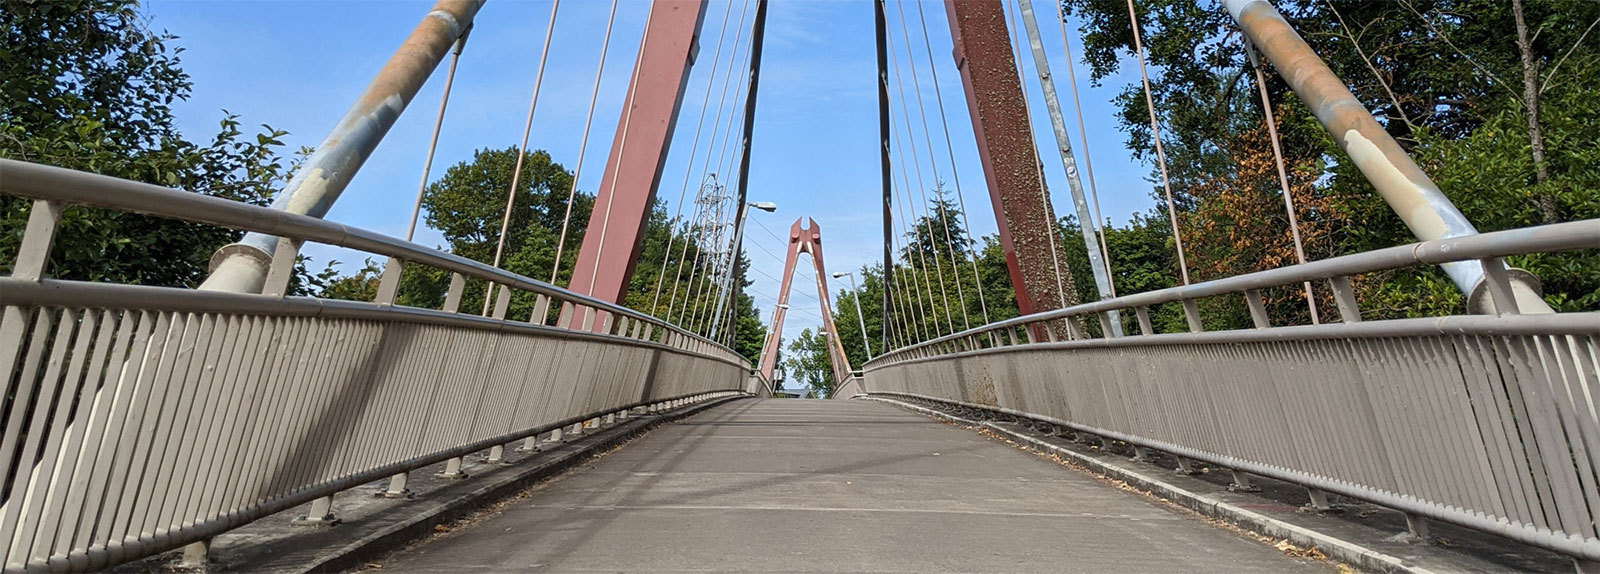 Alton Baker Footbridge path